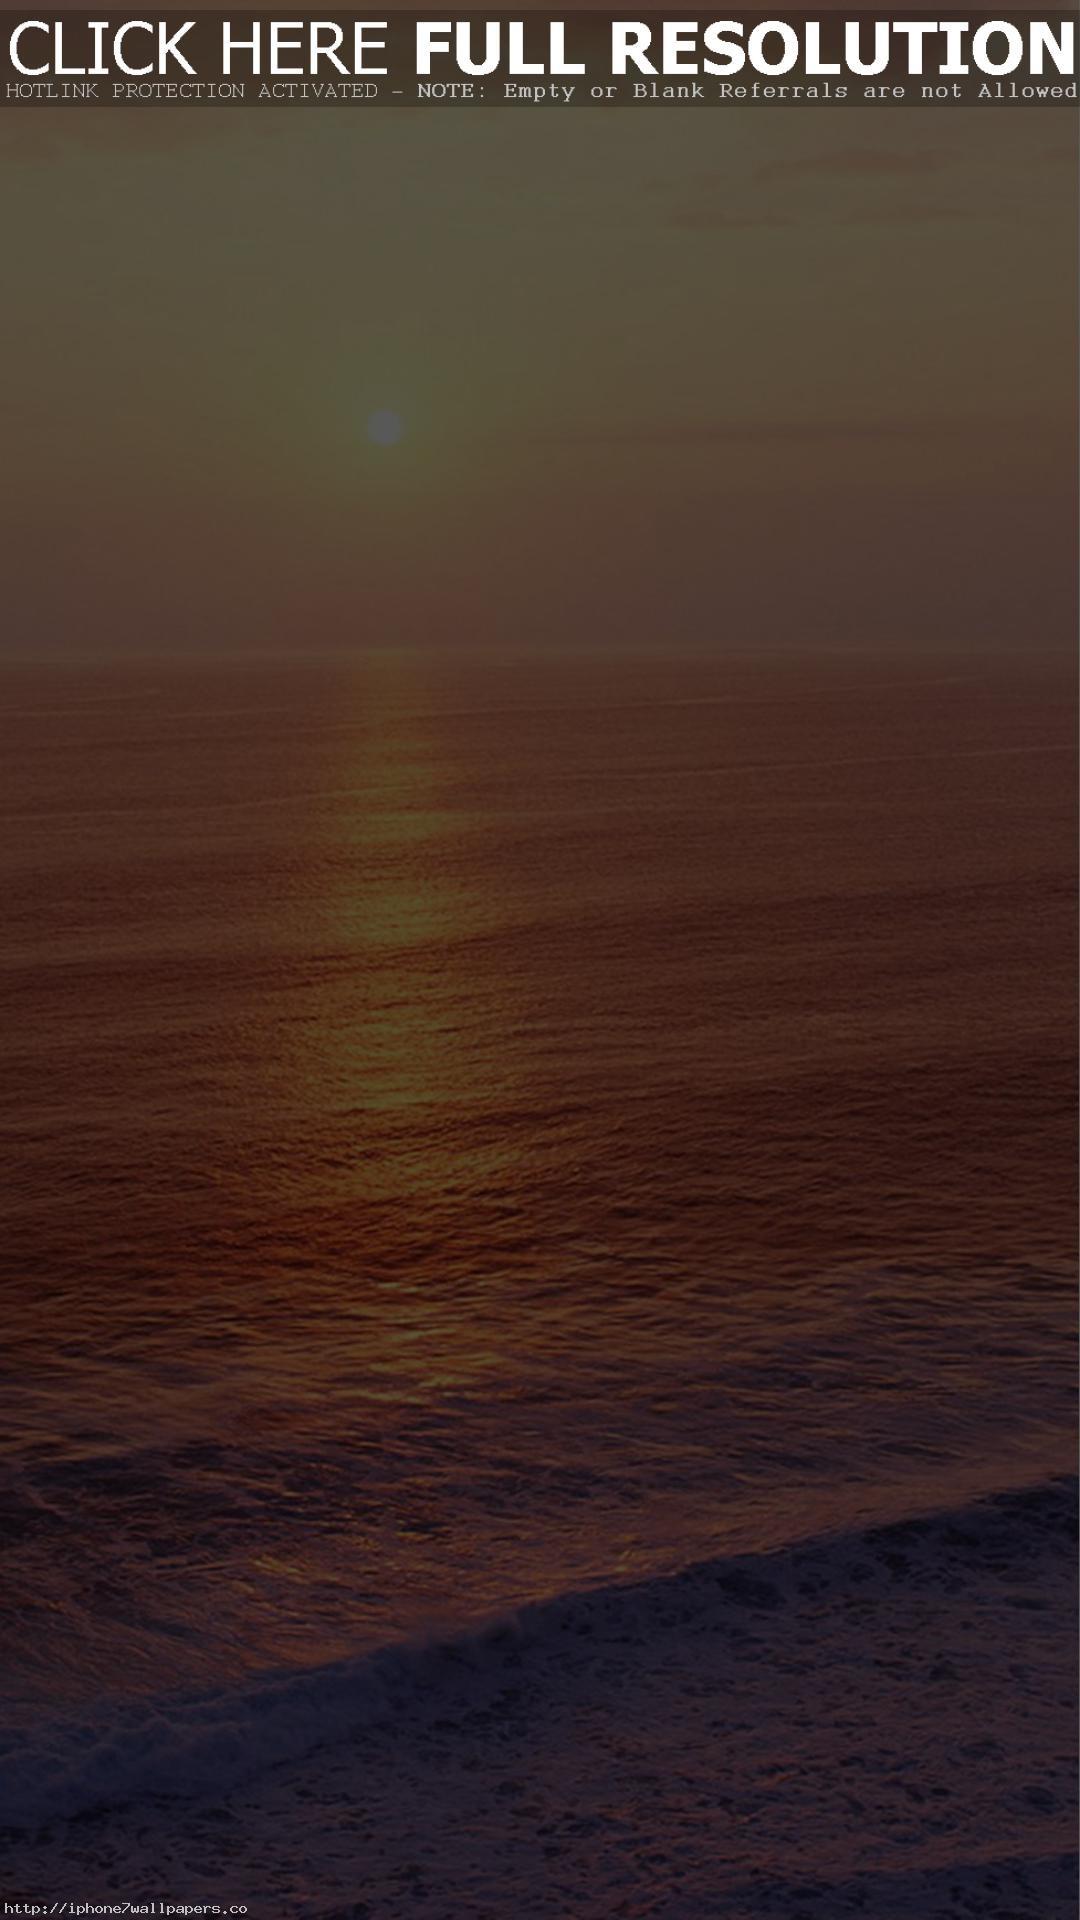 Hd Lock Screen Beach Iphone 6 Wallpaper